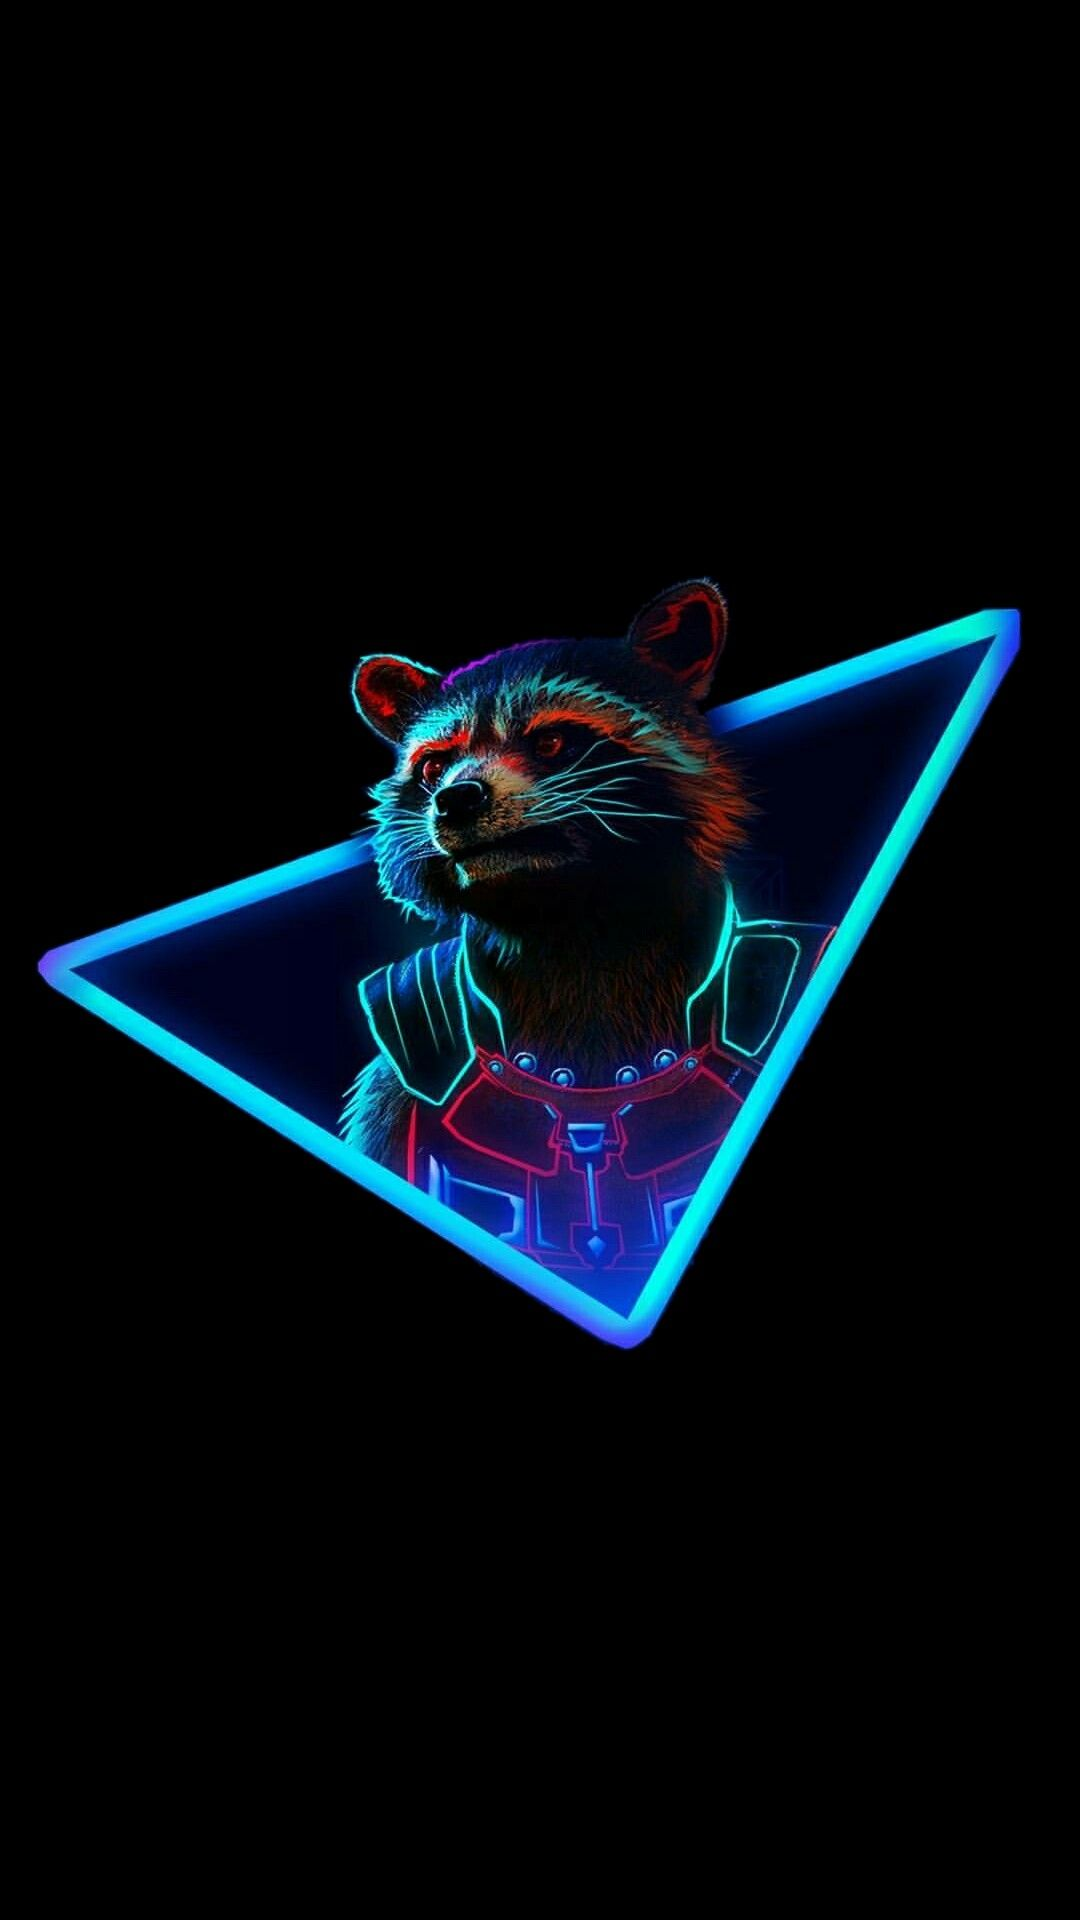 Rocket raccoon backgrounds fondo de pantalla - Rocket raccoon phone wallpaper ...